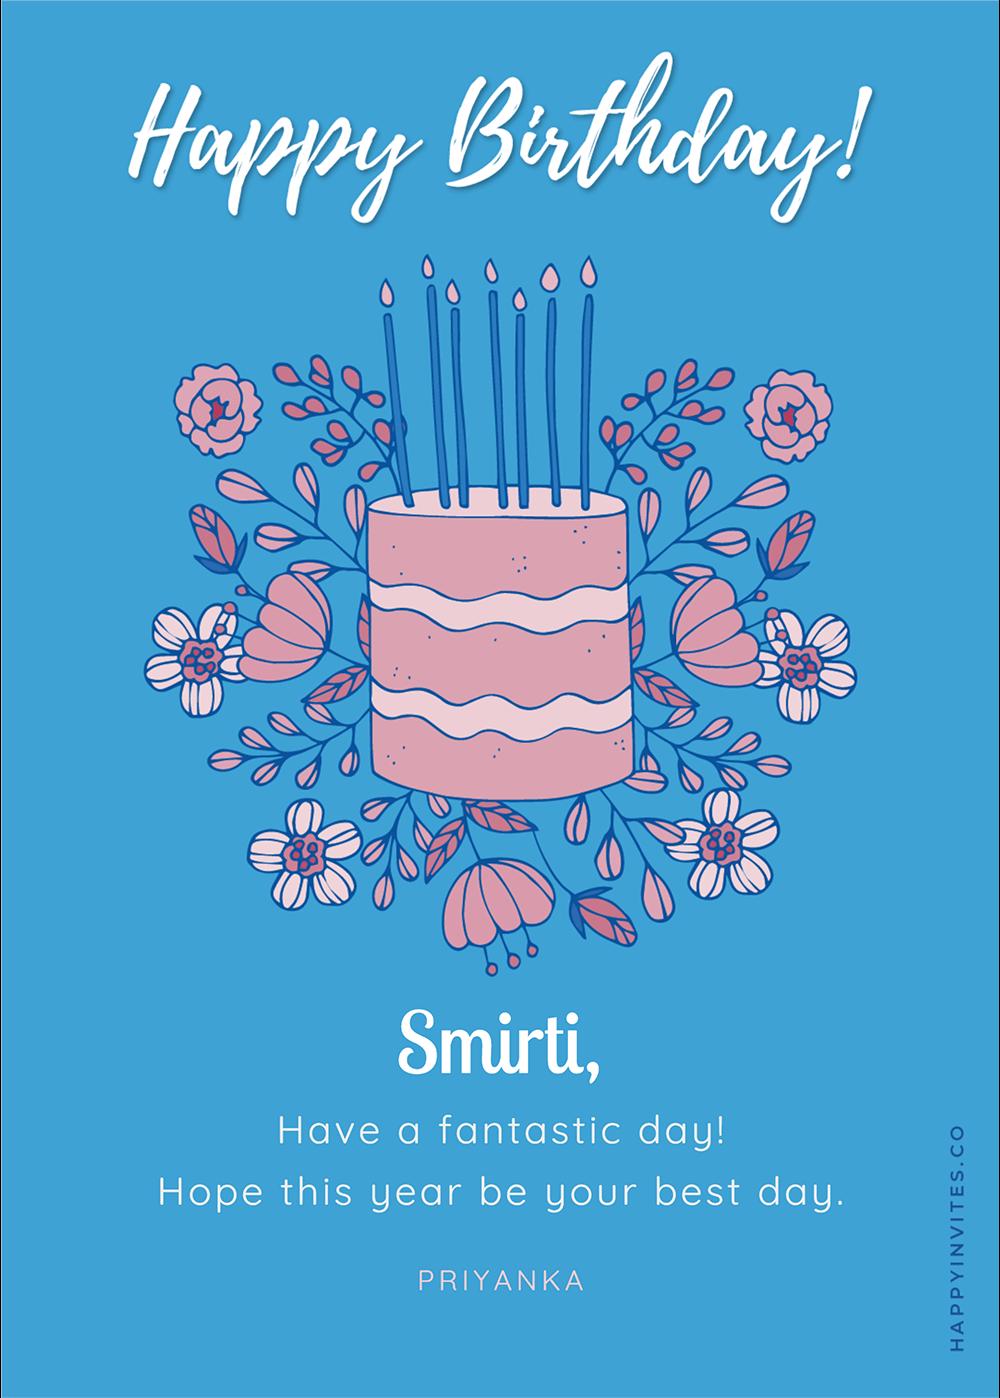 Hand drawn Card - Birthday Wishes Greeting Card